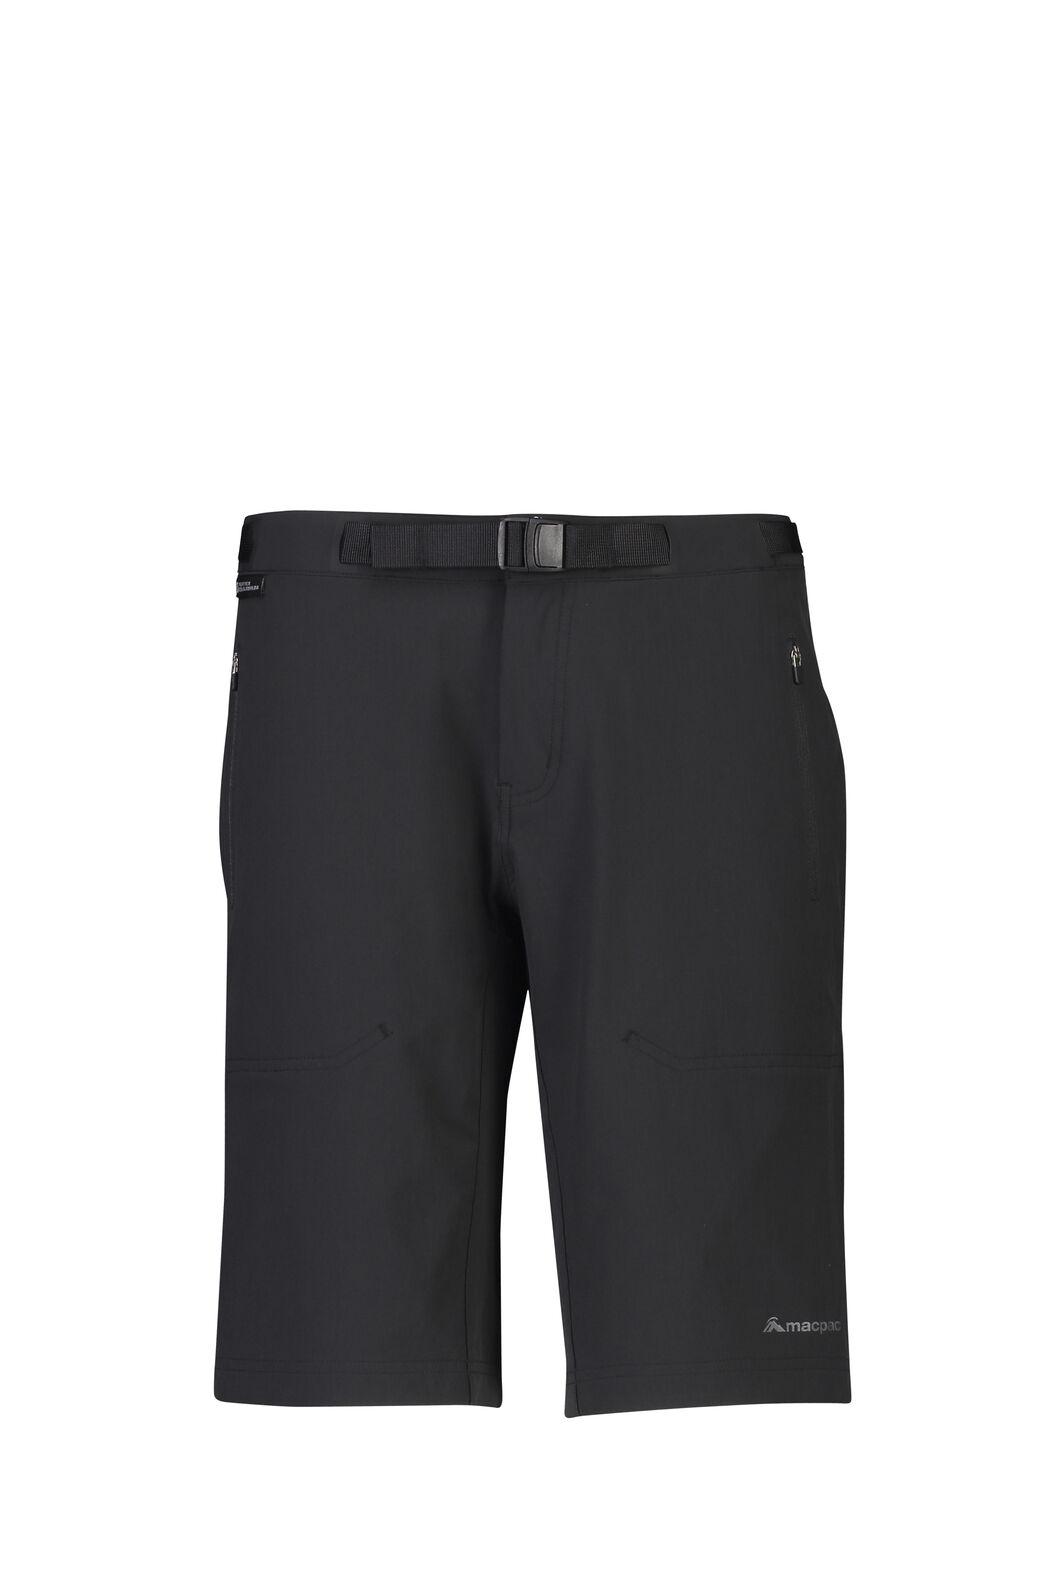 Macpac Trekker Pertex® Equilibrium Softshell Shorts — Women's, Black, hi-res